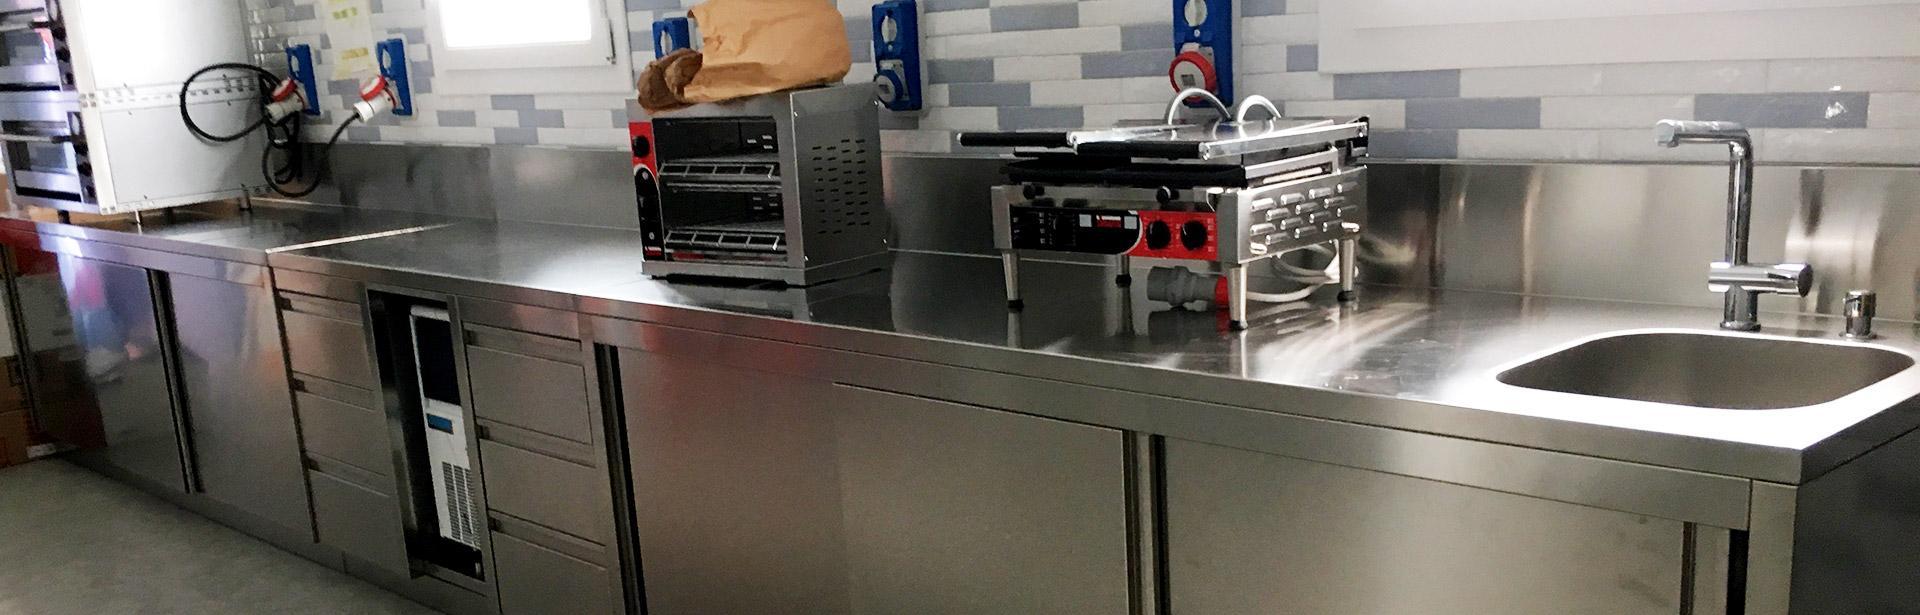 Arredamento cucine professionali verona